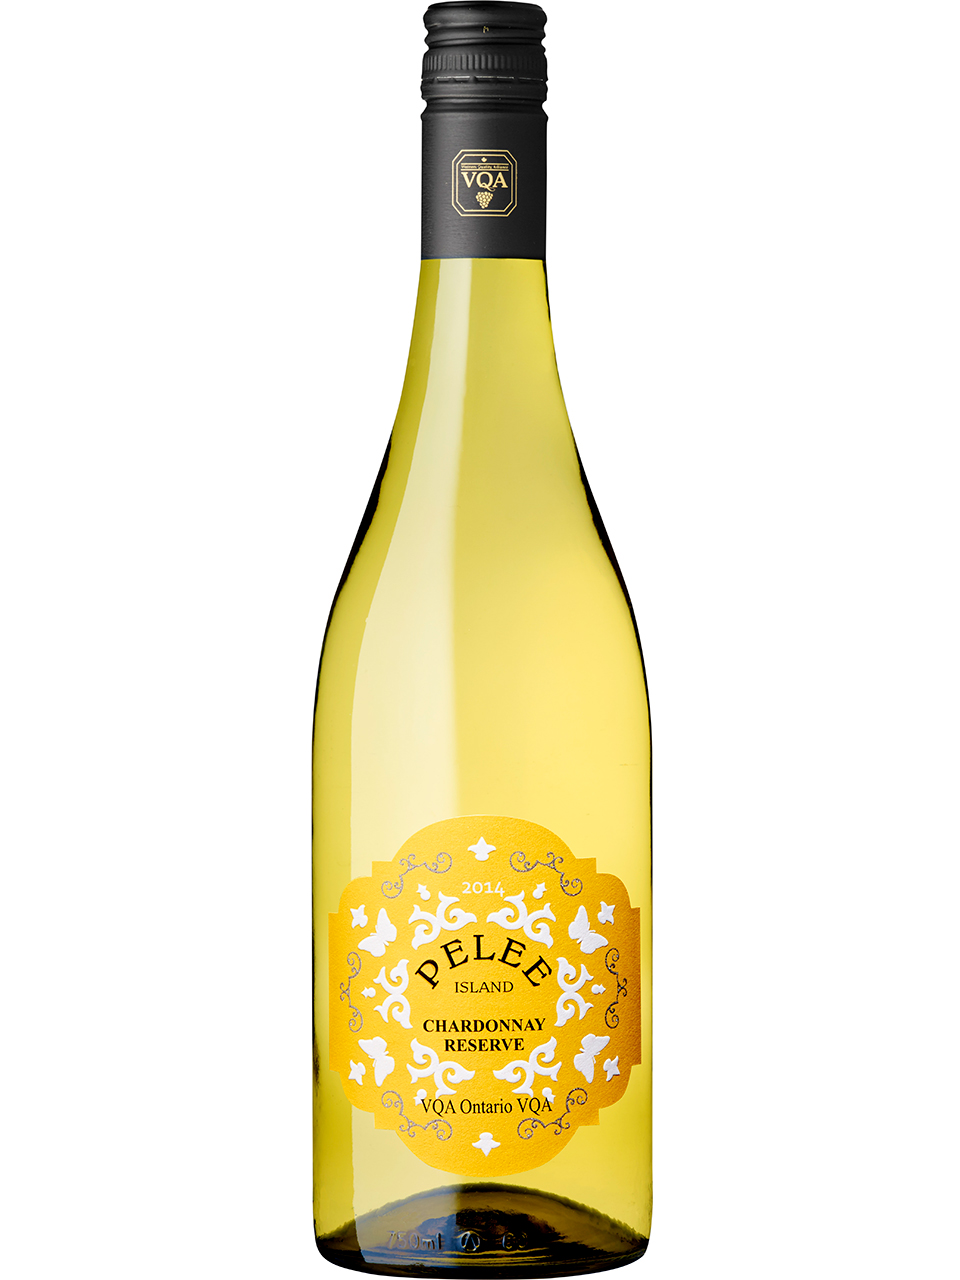 Pelee Island Chardonnay Reserve VQA